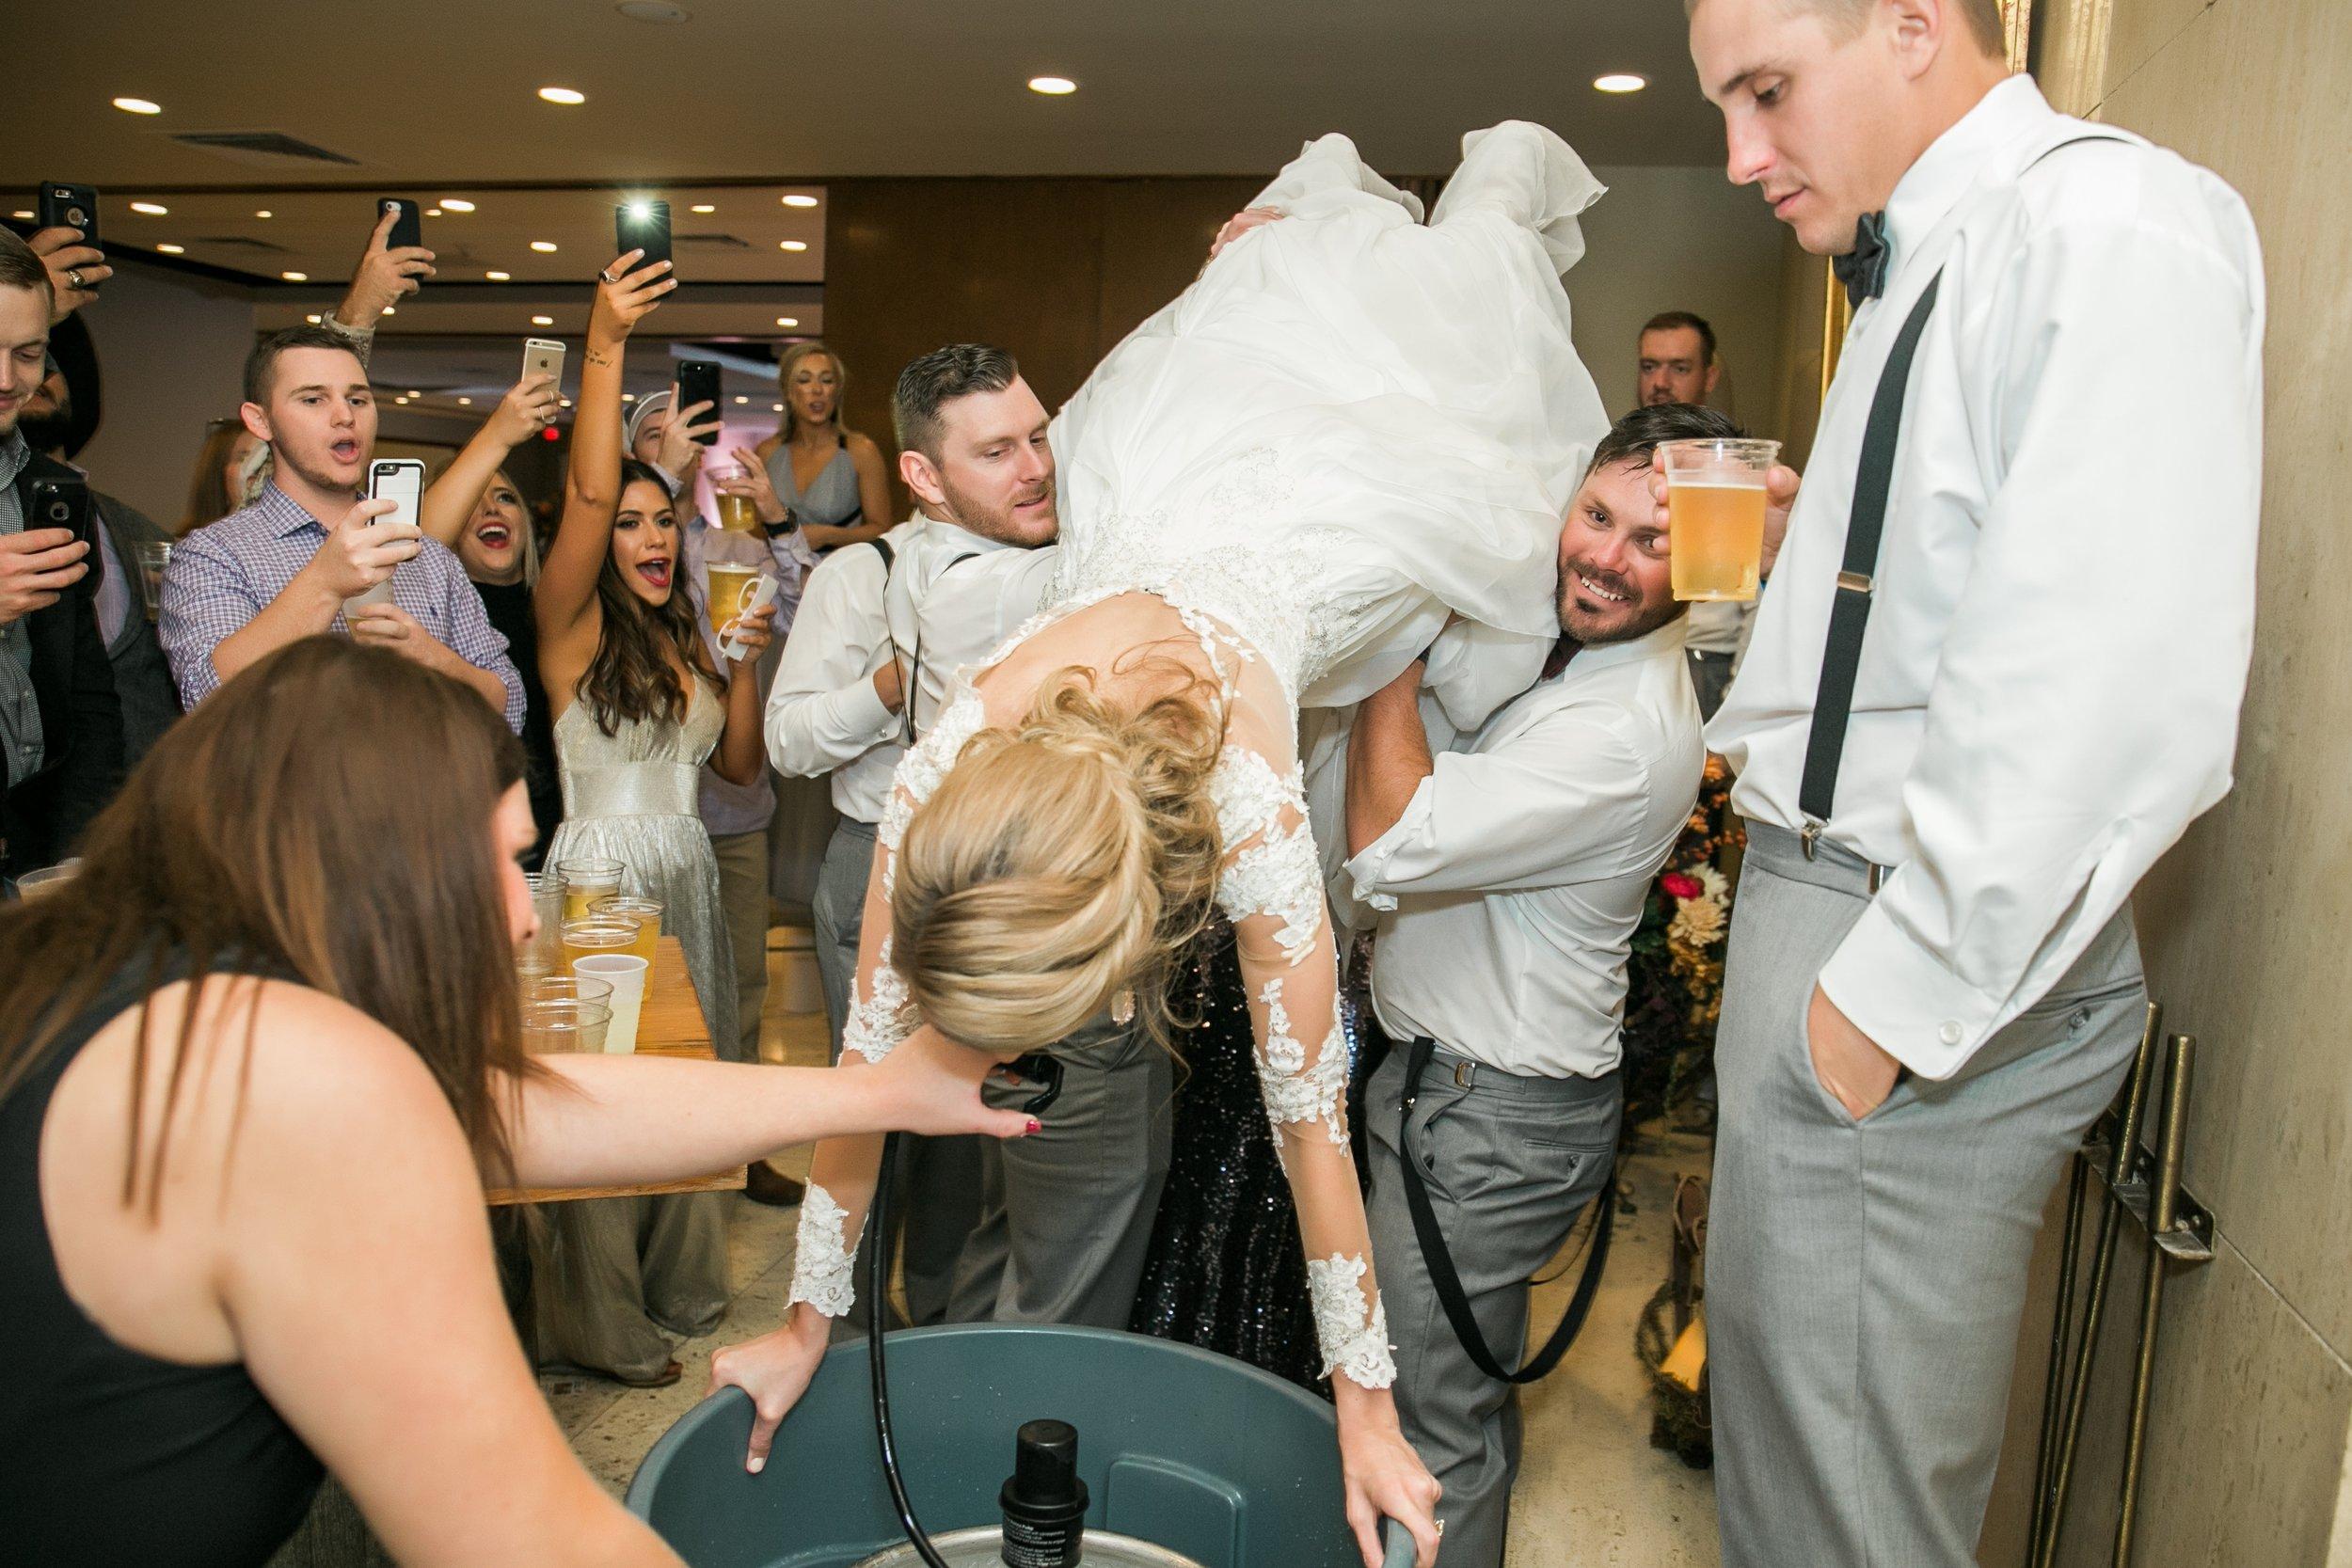 Roberson-Wedding-The-Forum-Lauren-Pinson-Wedding-Photography-Wichita-Falls-Texas-090.jpg